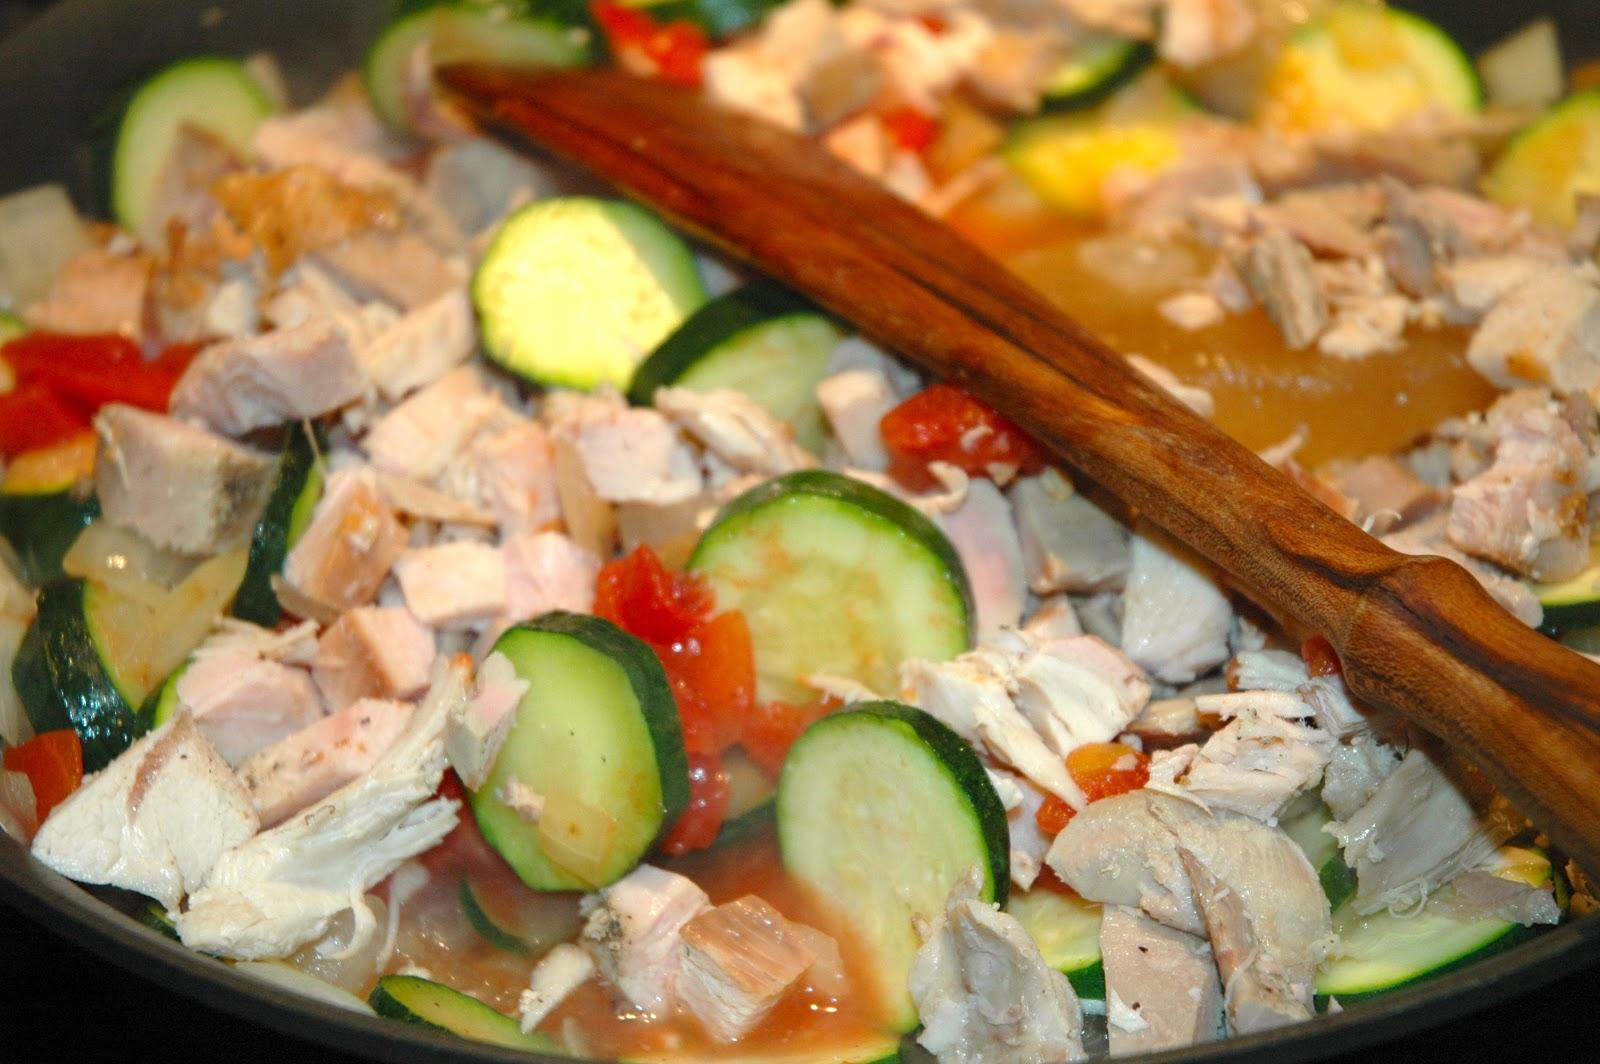 ThreeDietsOneDinner - Paleo Recipes to fit every diet - Paleo Weight